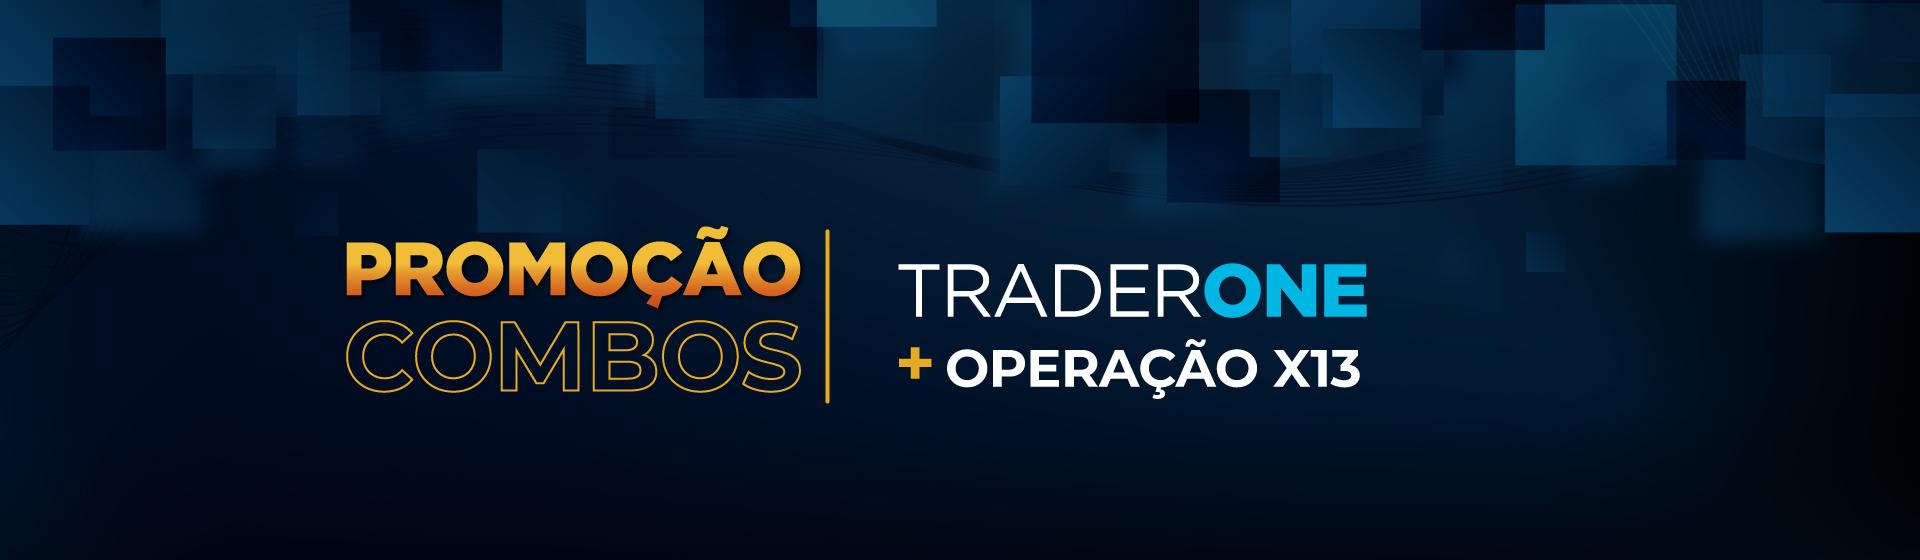 2 banner trader%2bx13